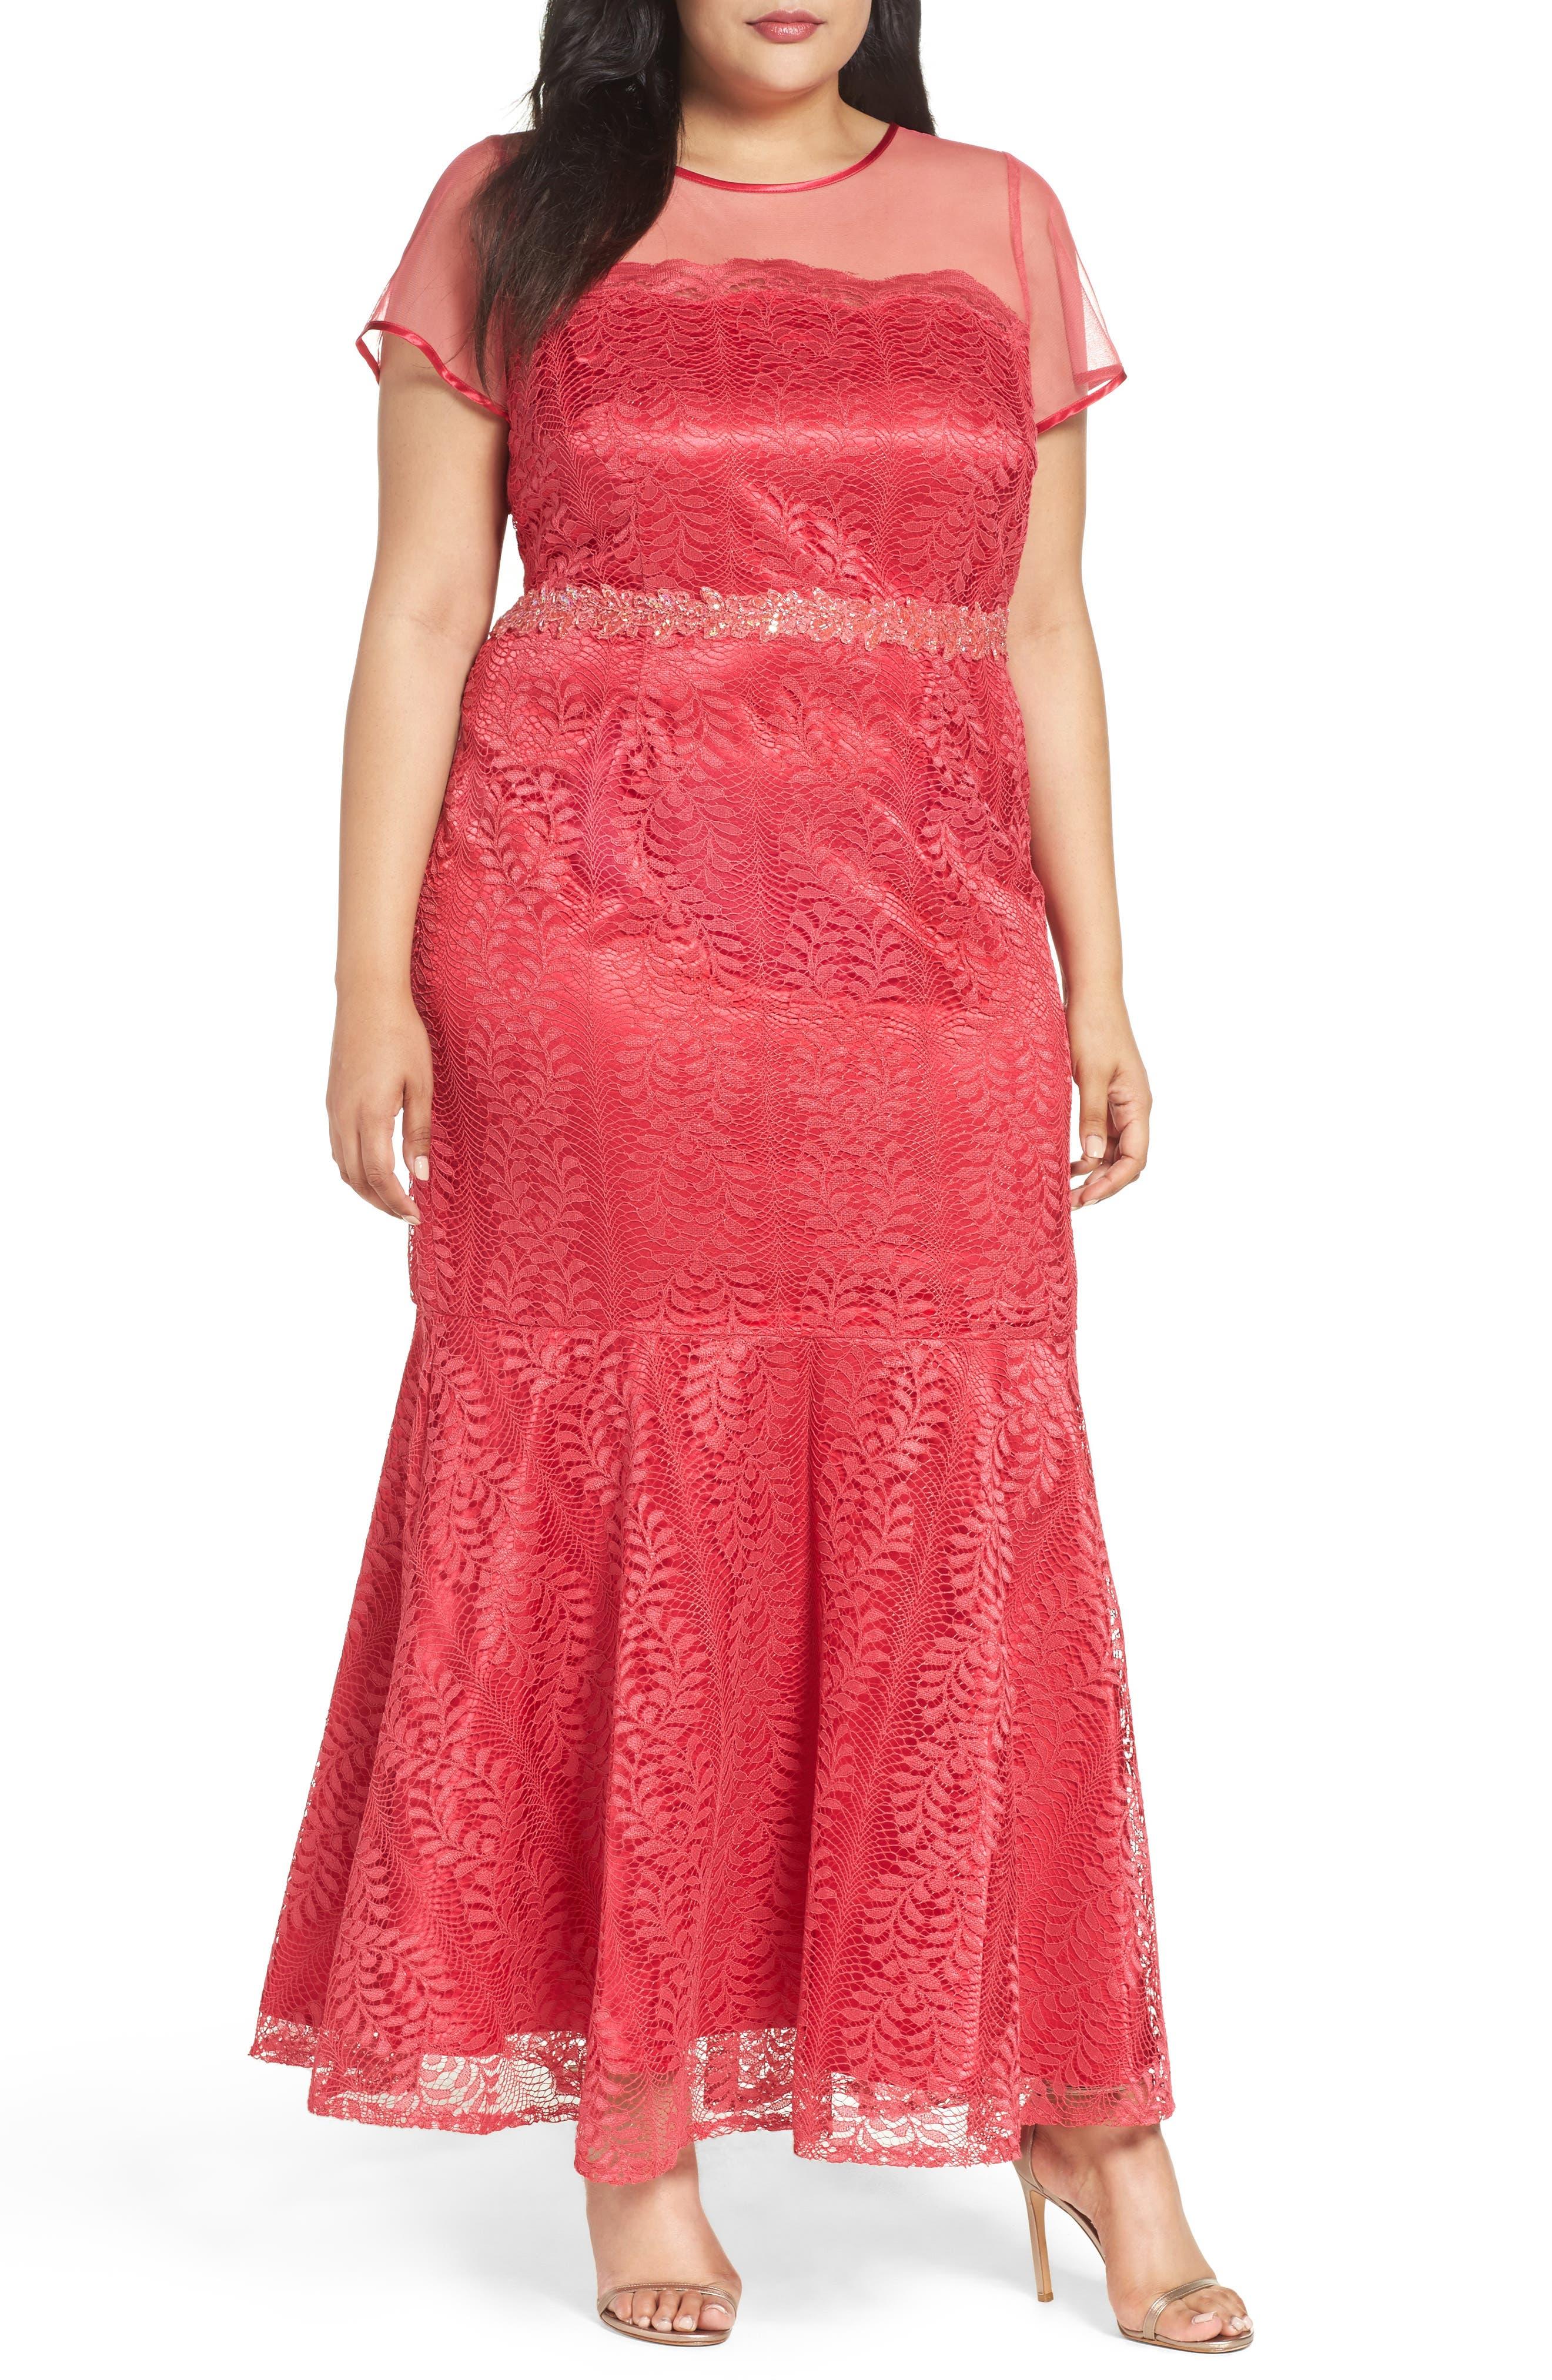 Main Image - Brianna Illusion Yoke Lace Mermaid Gown (Plus Size)